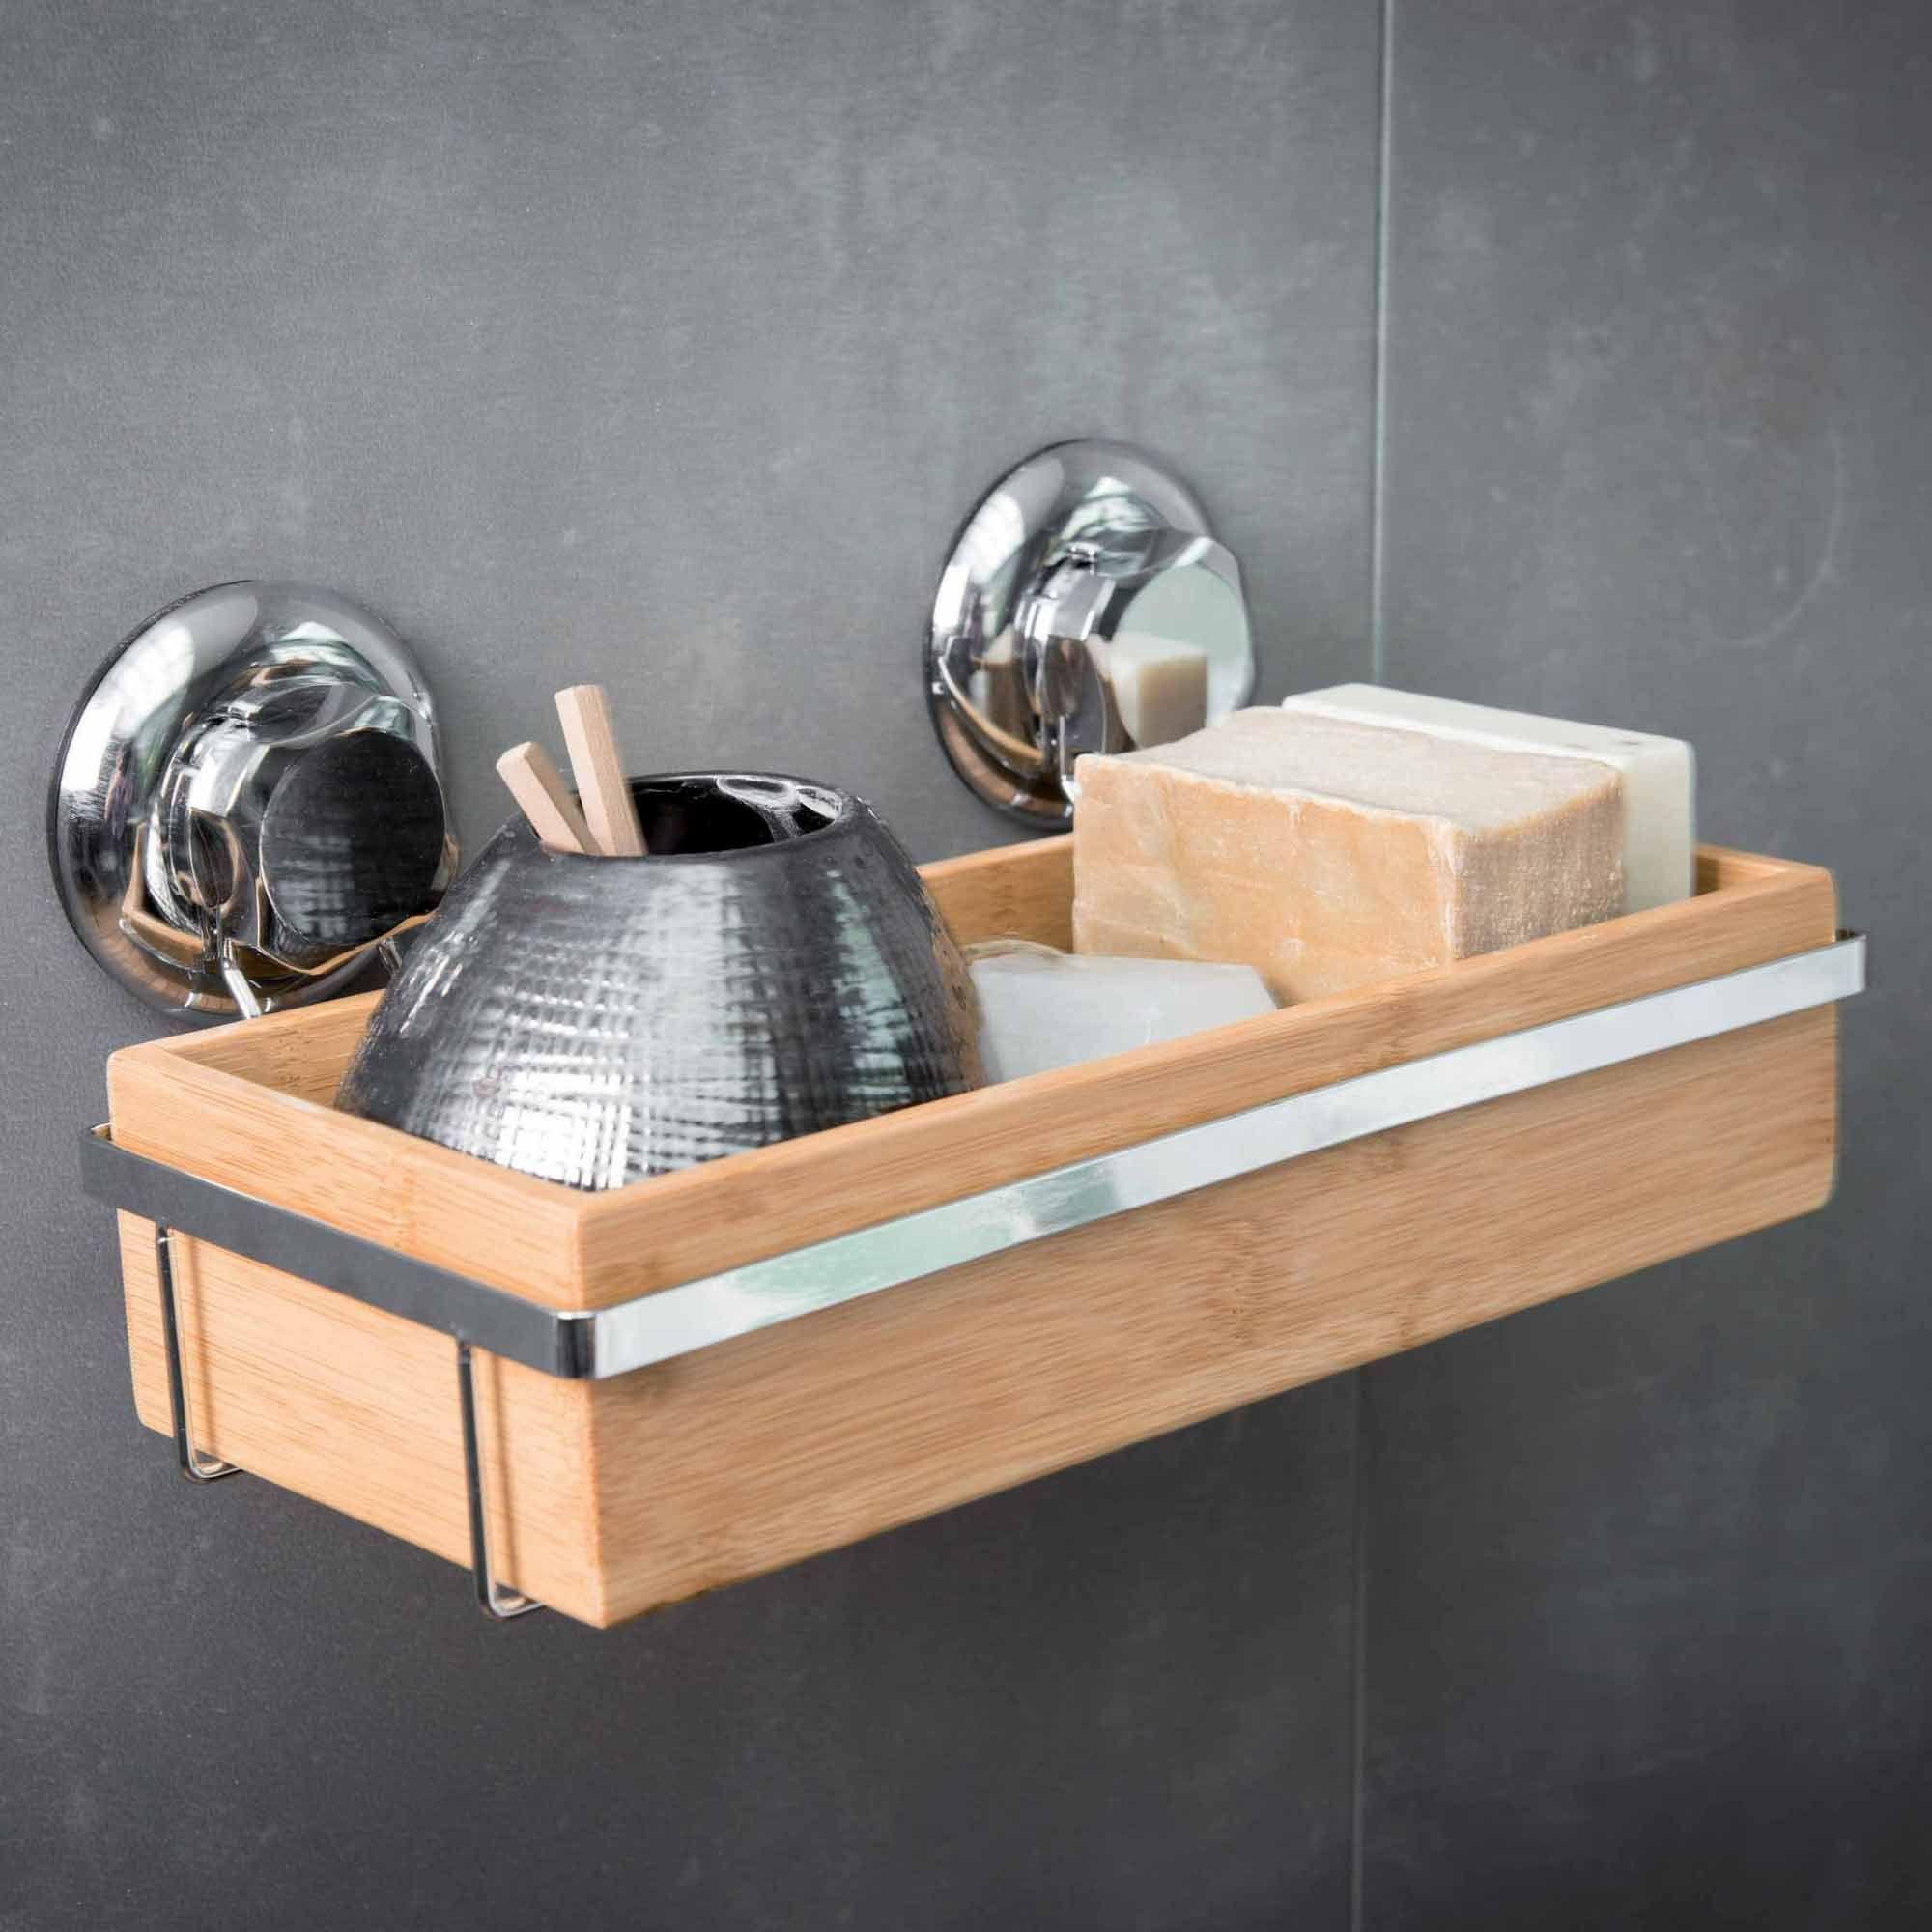 locks spas and ps on pinterest - Accessoire Salle De Bain Bambou